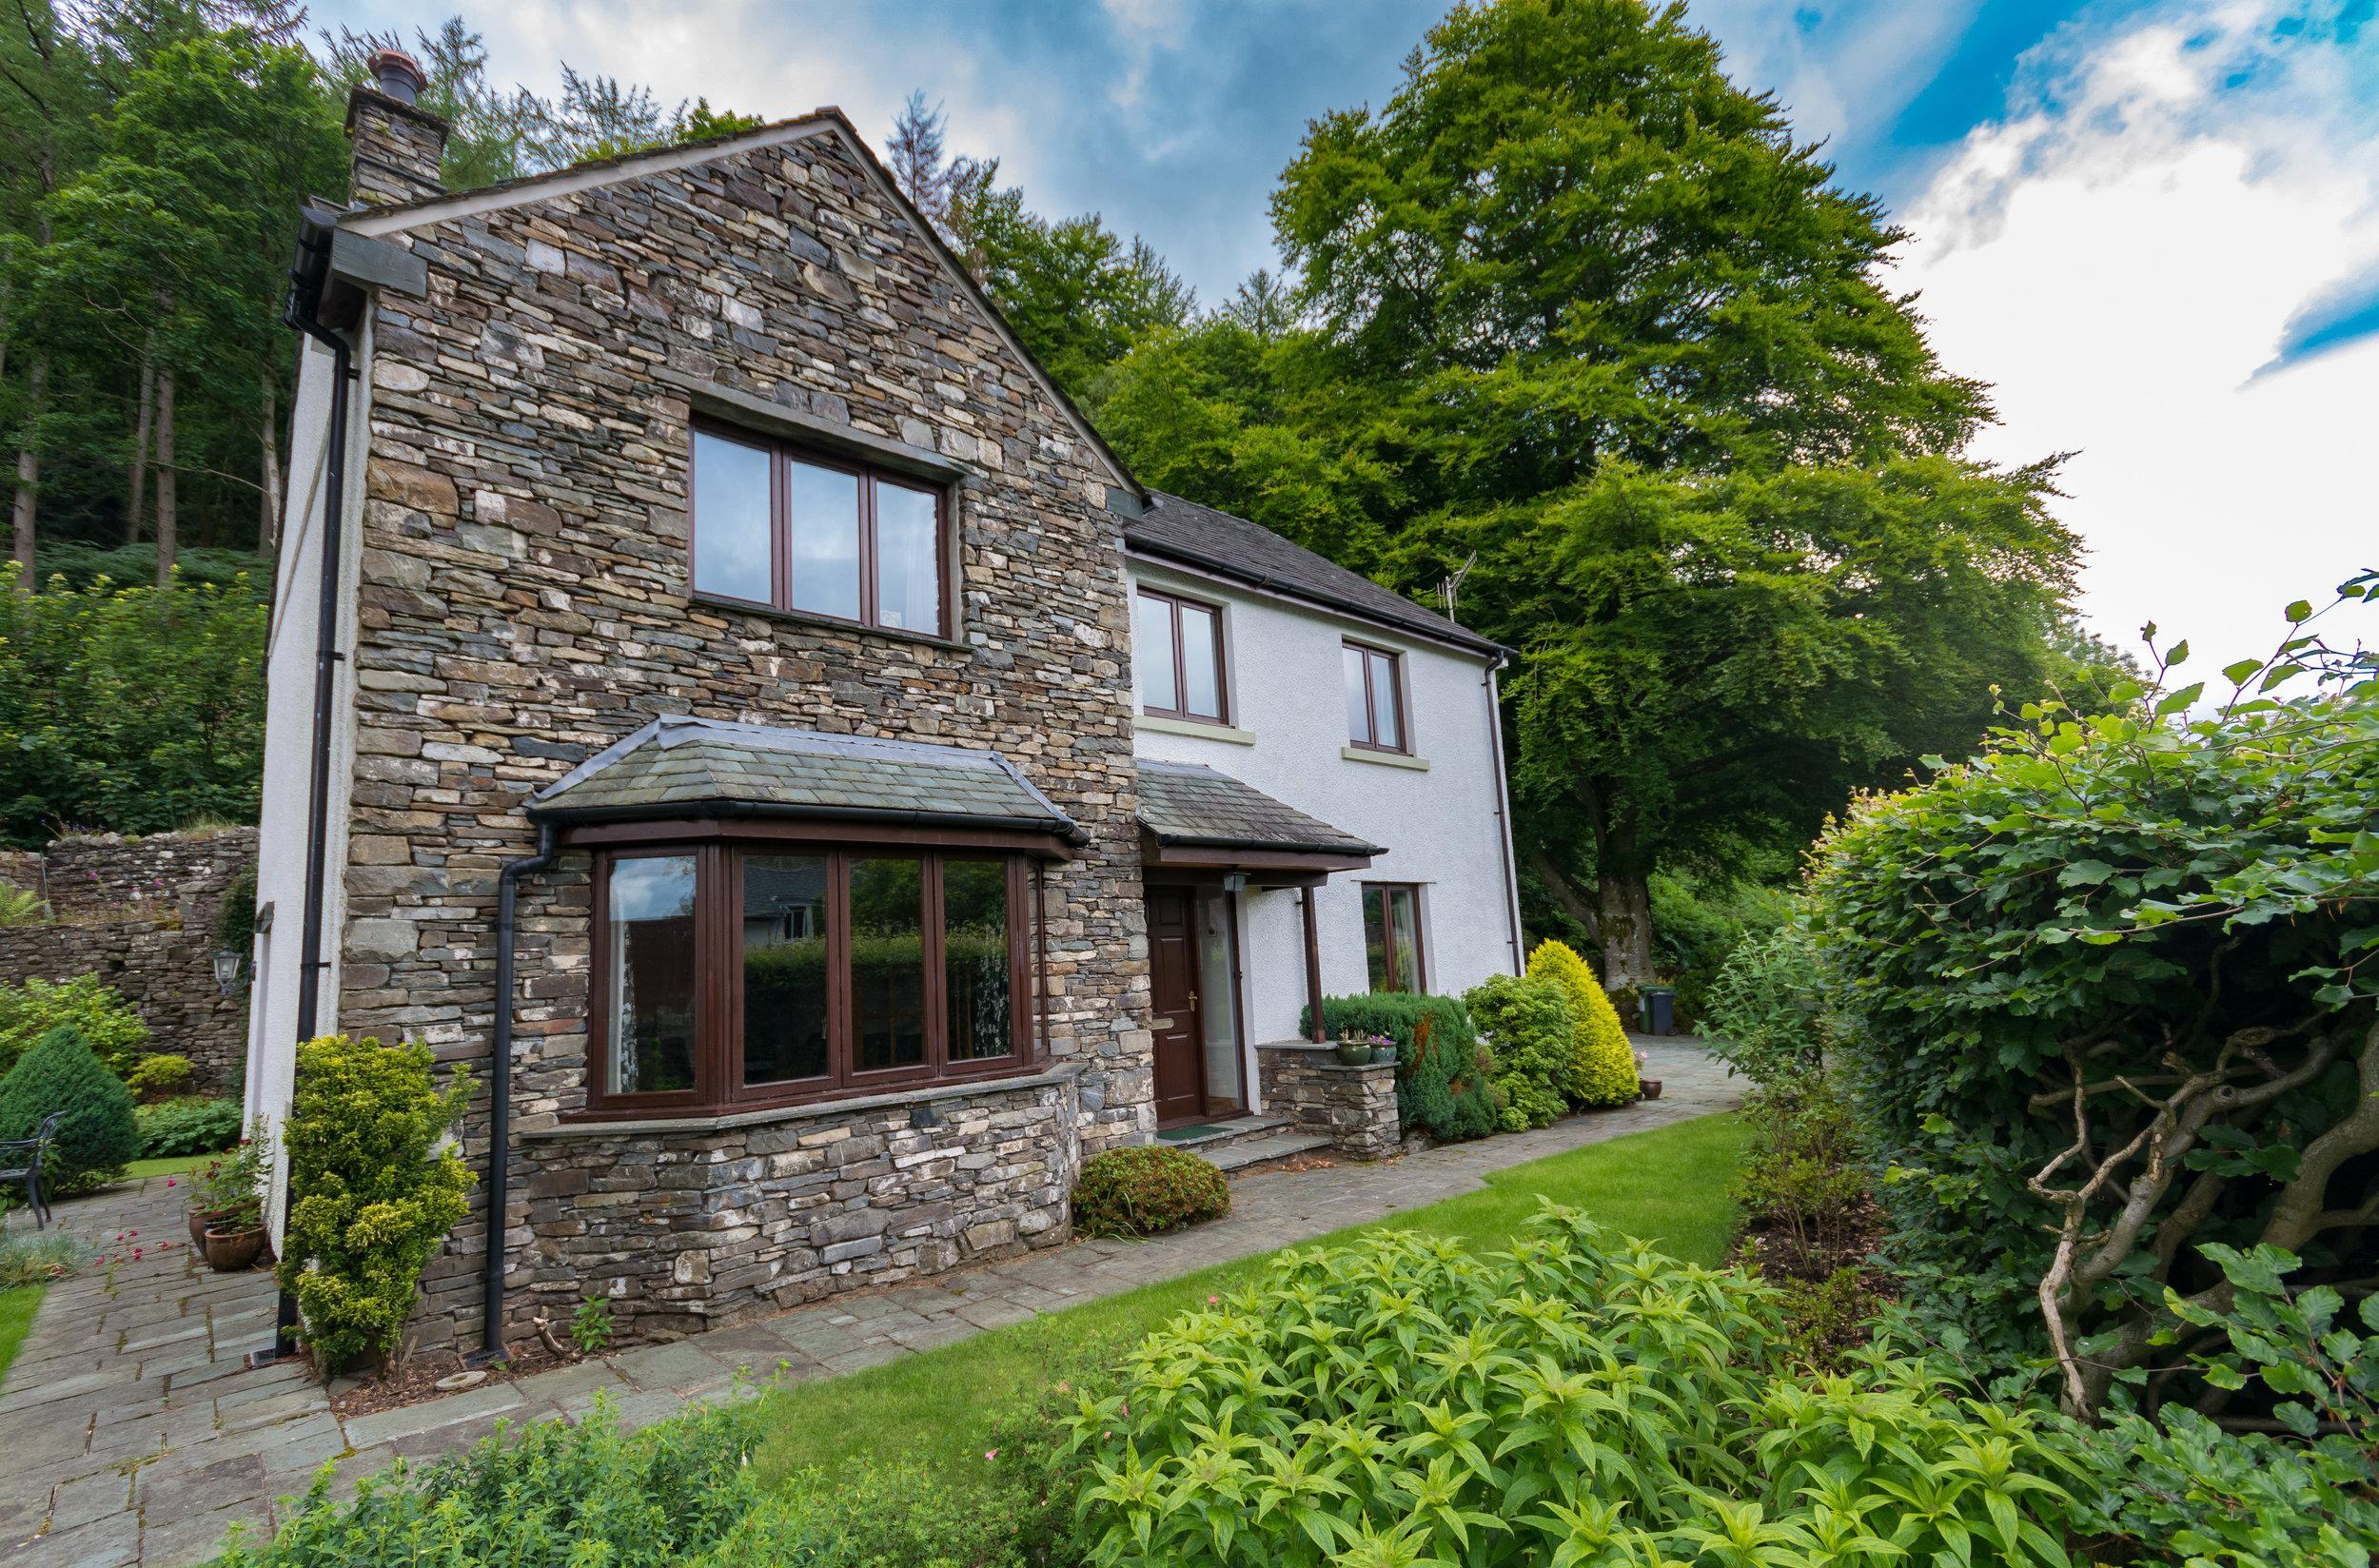 Beech+Nook+Cottage+Thornthwaite+Your+Keswick+Holidays.jpg